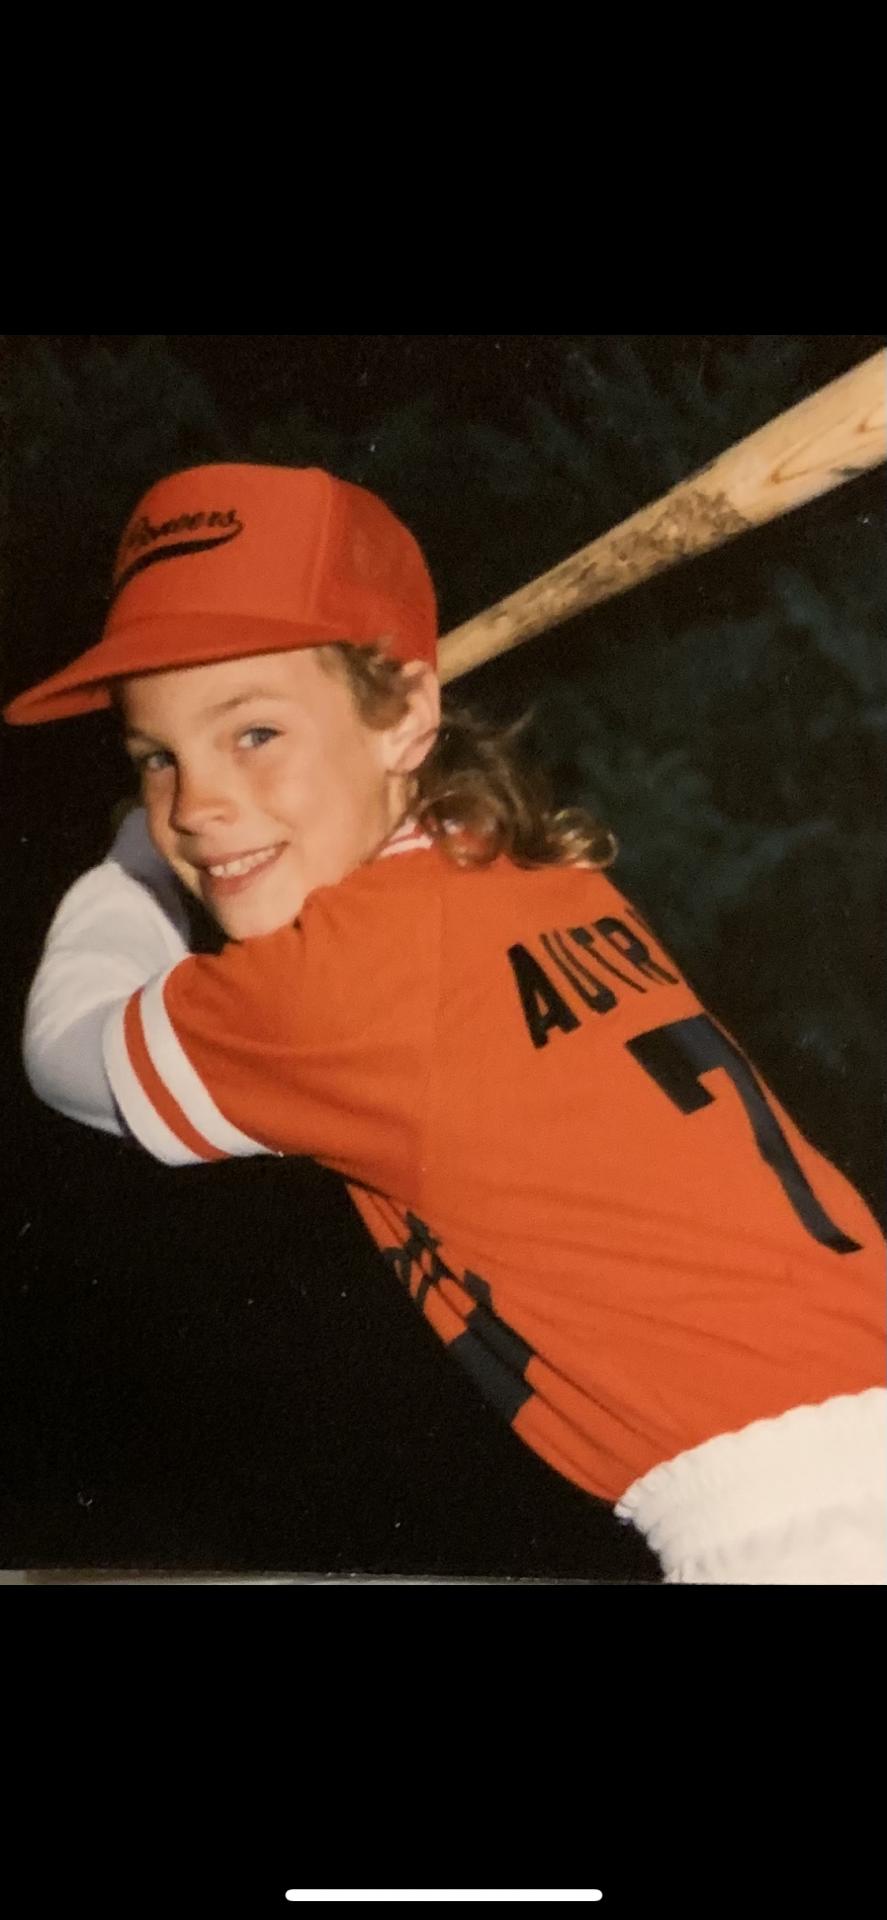 Jason's team baseball picture.